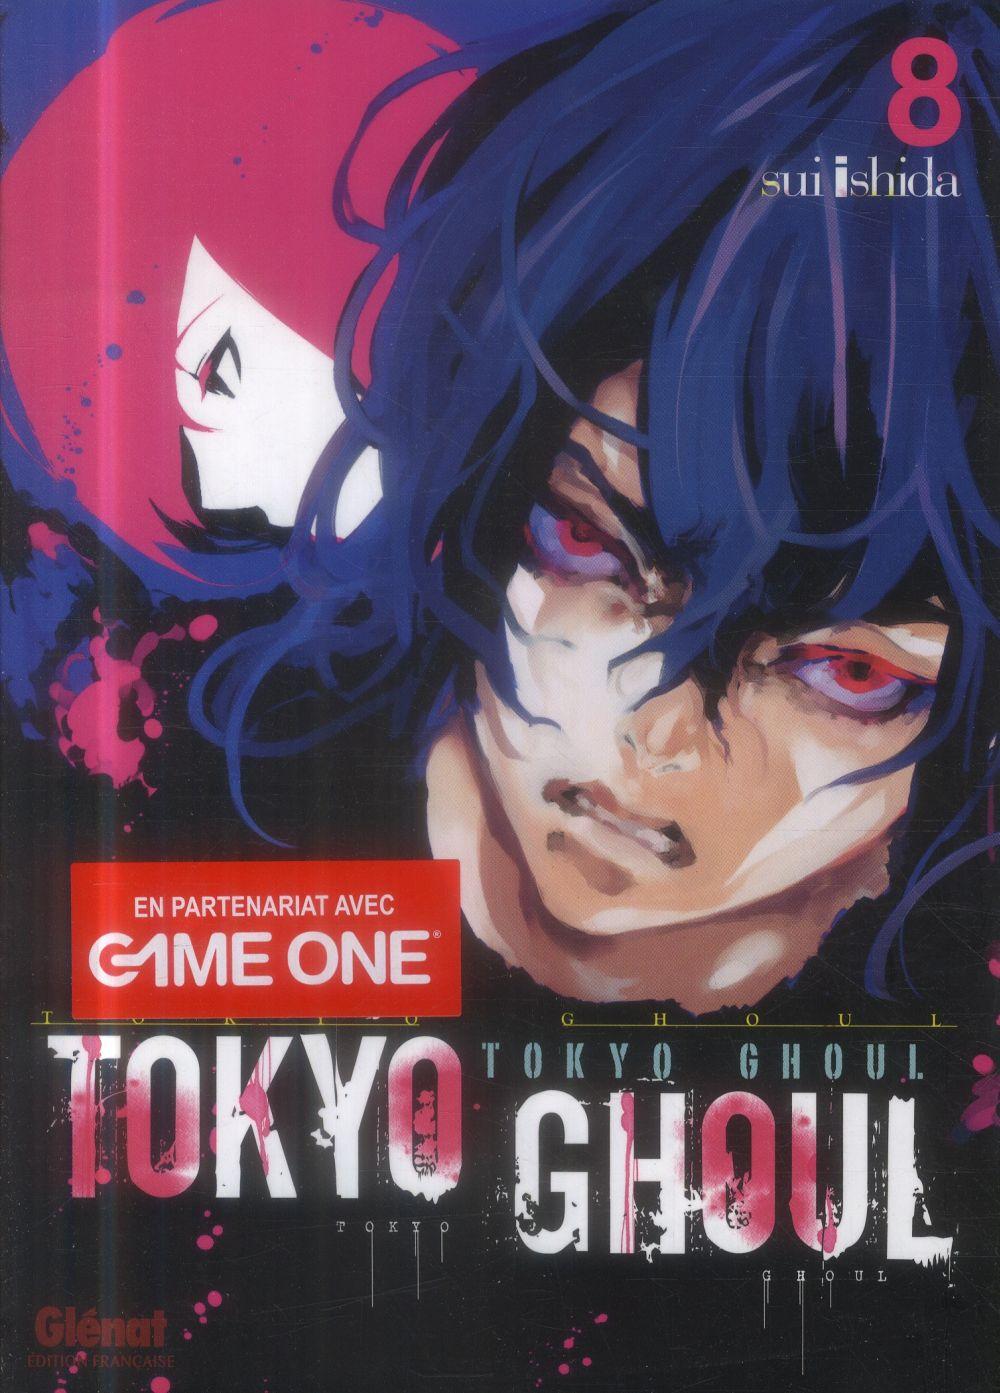 TOKYO GHOUL - TOME 08 Ishida Sui Glénat